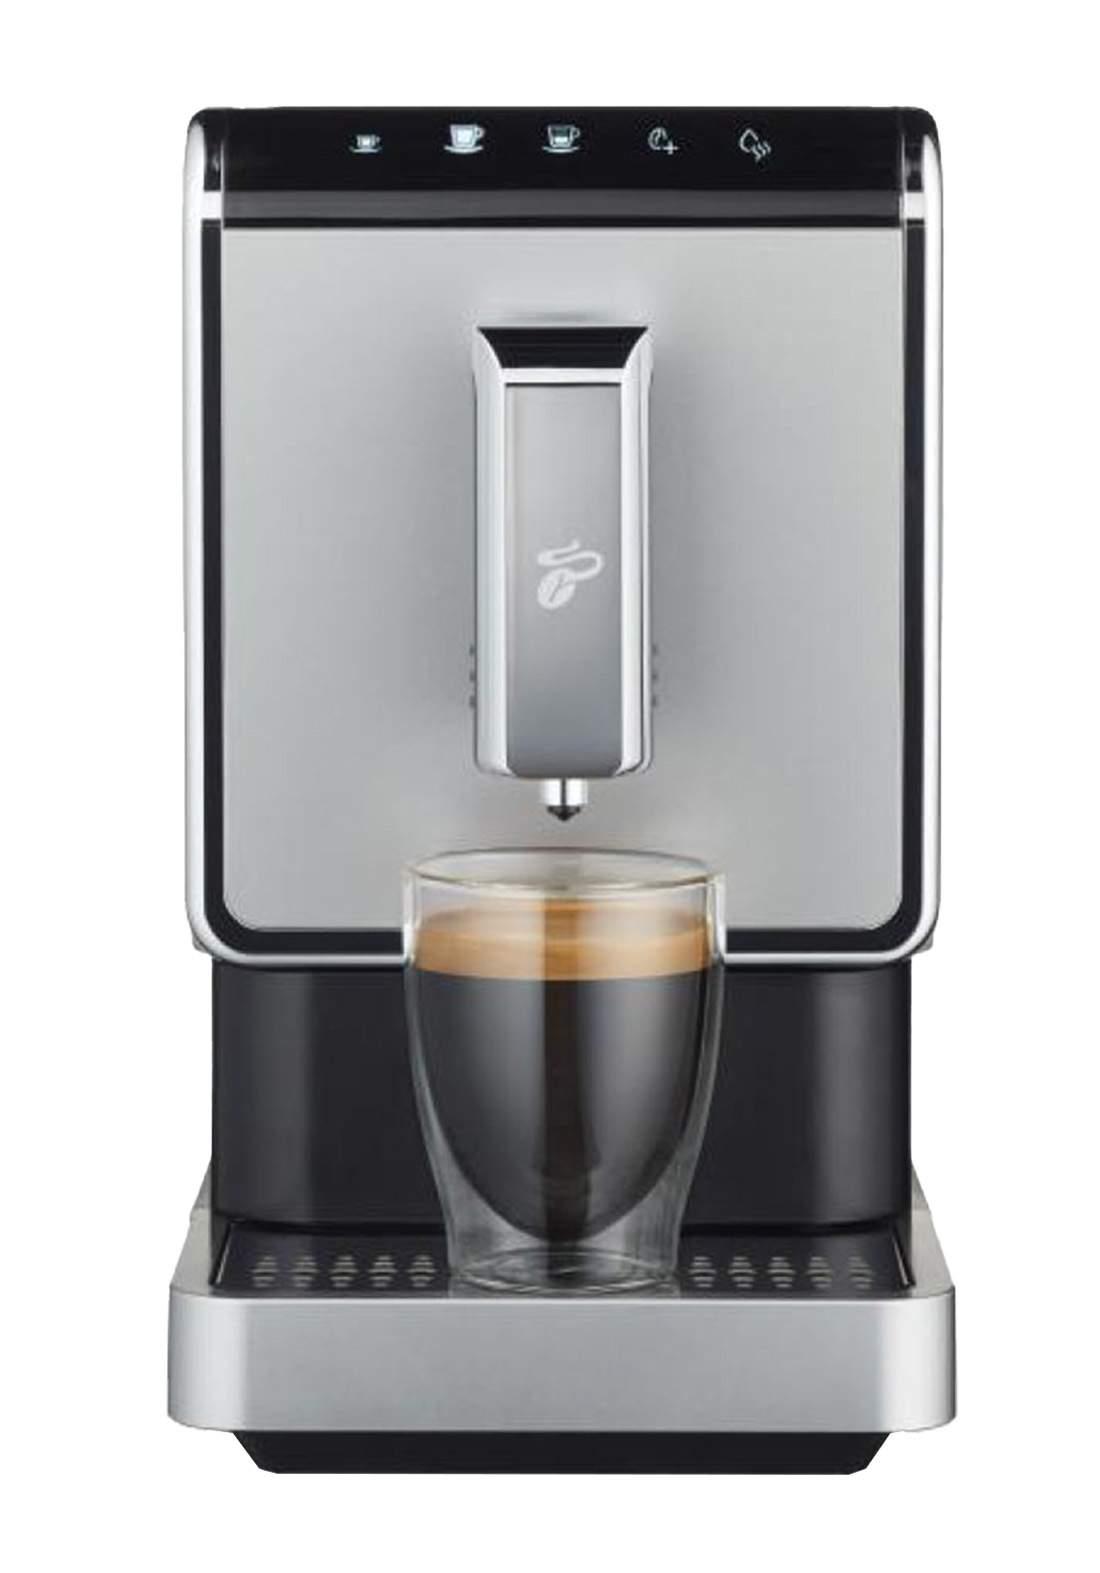 Tchibo Coffe Machine 1470 Watt ماكنة صنع قهوة